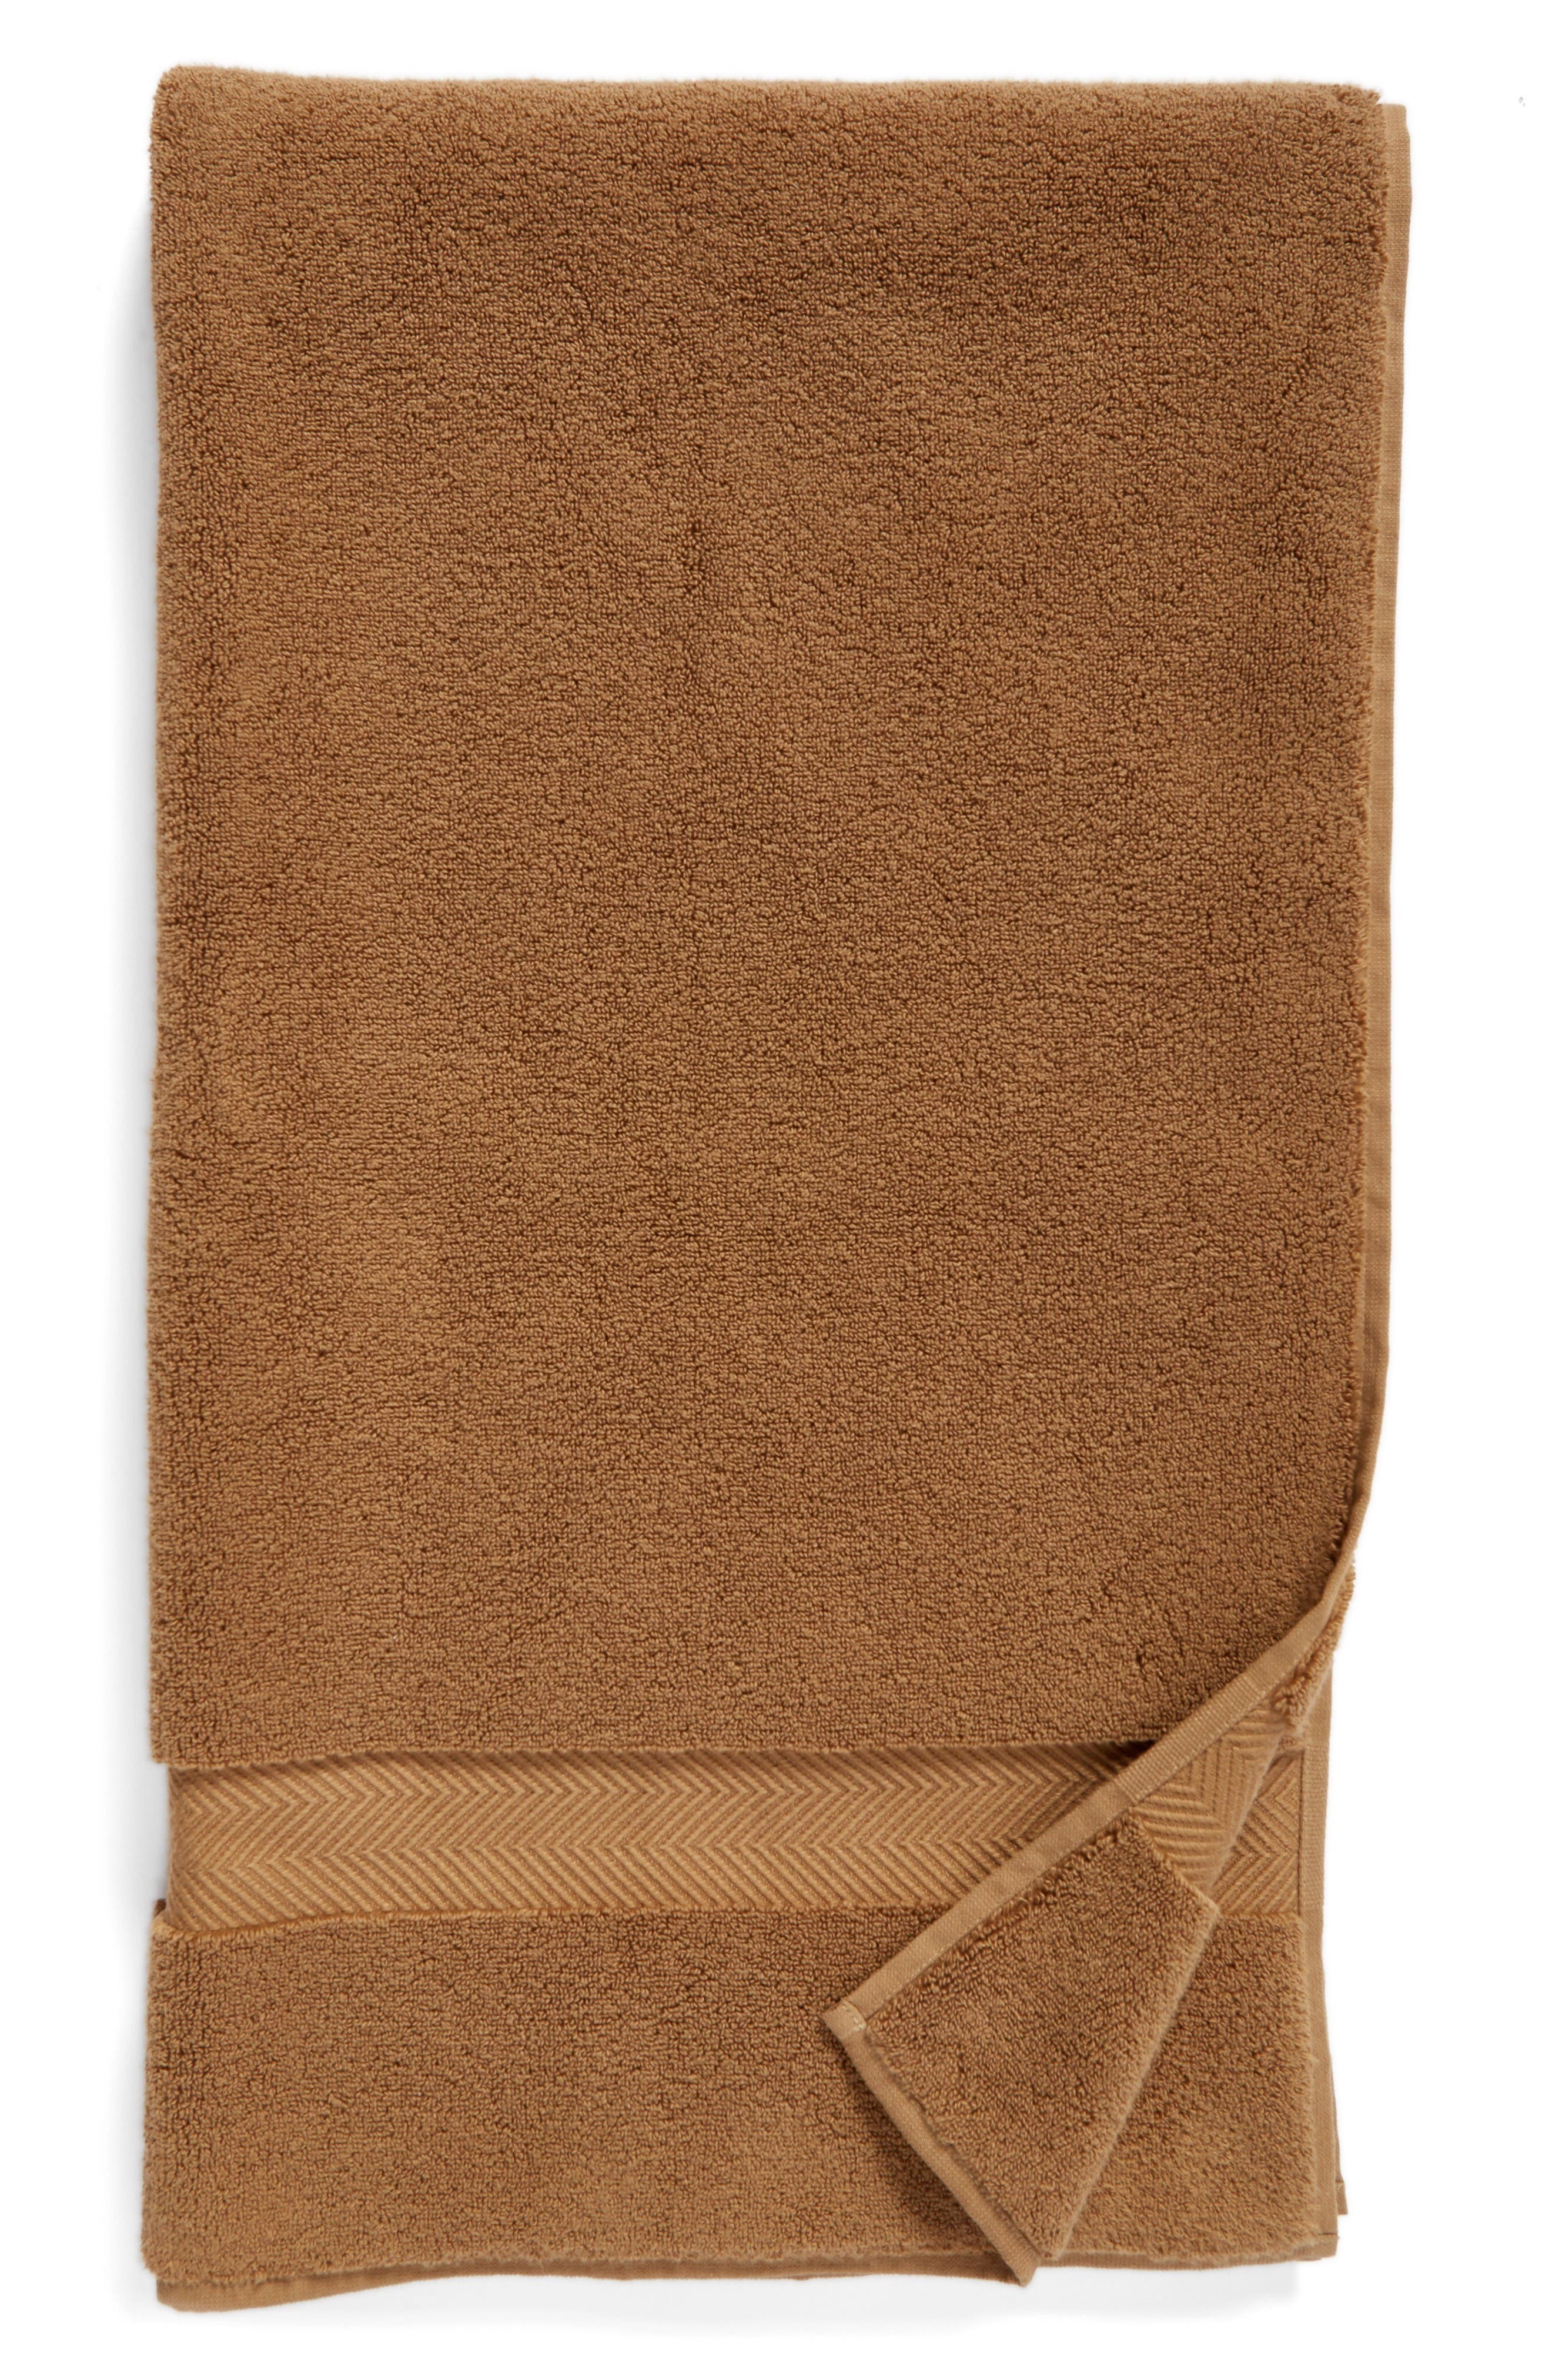 Hydrocotton Bath Towel,                         Main,                         color, Brown Otter